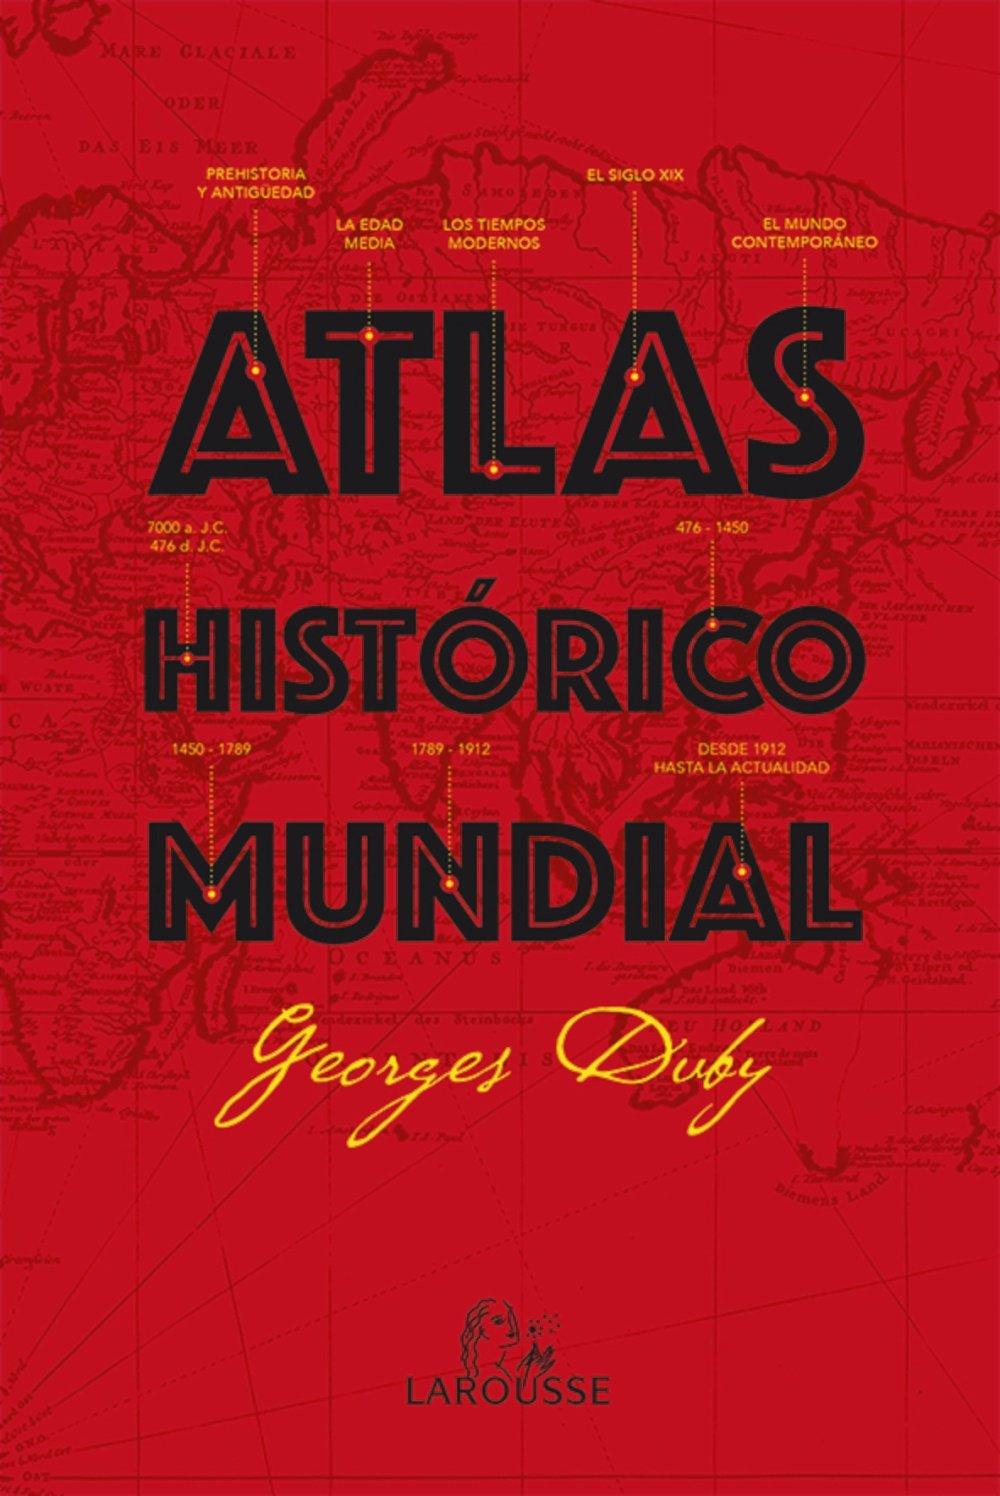 Atlas Histórico Mundial G.Duby (Larousse - Atlas): Amazon.es: Duby, Georges: Libros